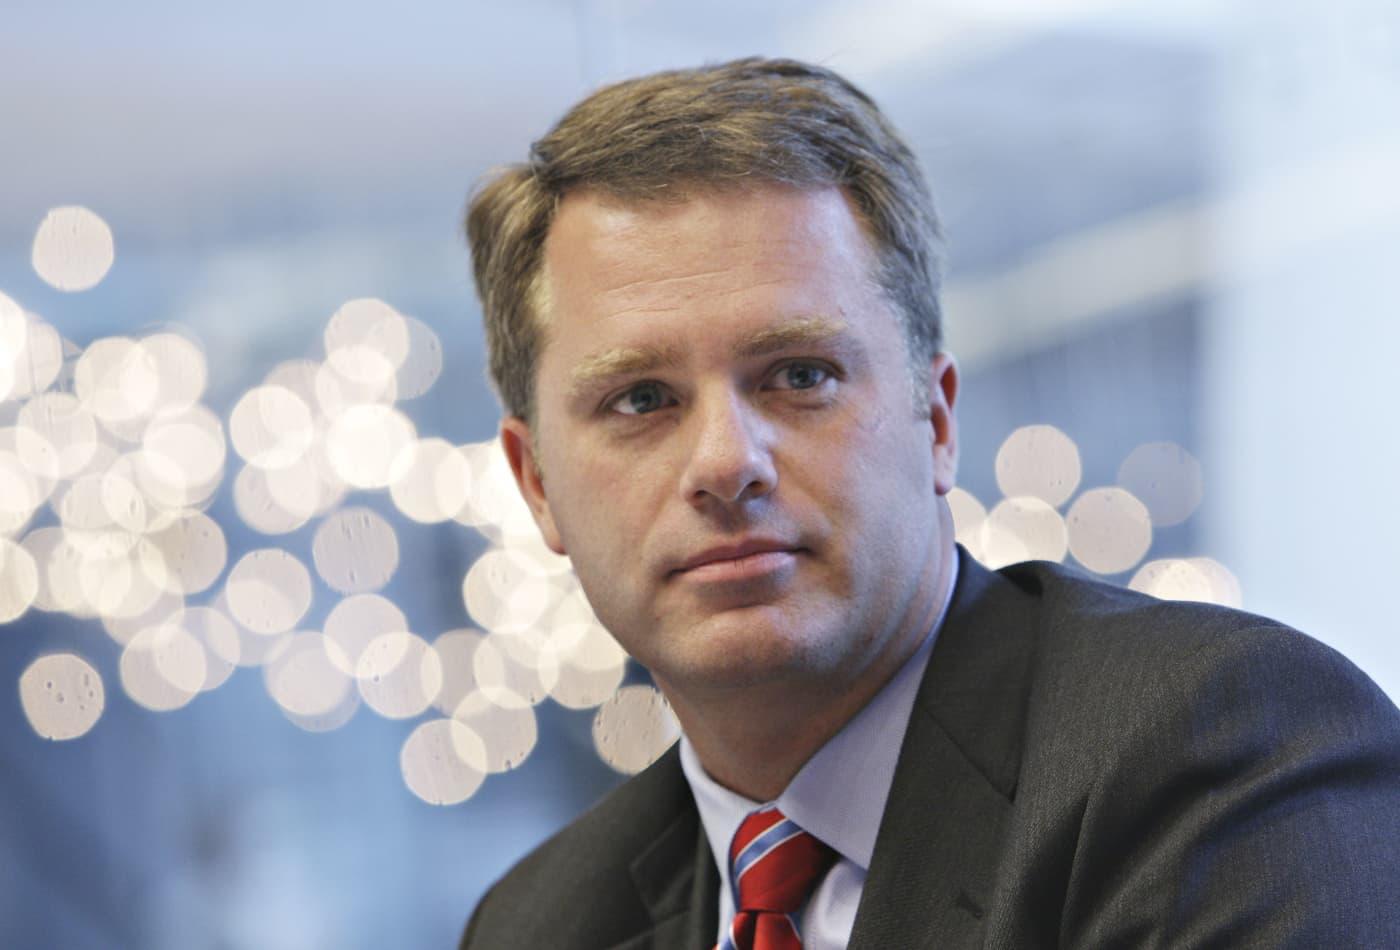 Walmart CEO Doug McMillon says 'too soon' to forecast hit from deadly coronavirus